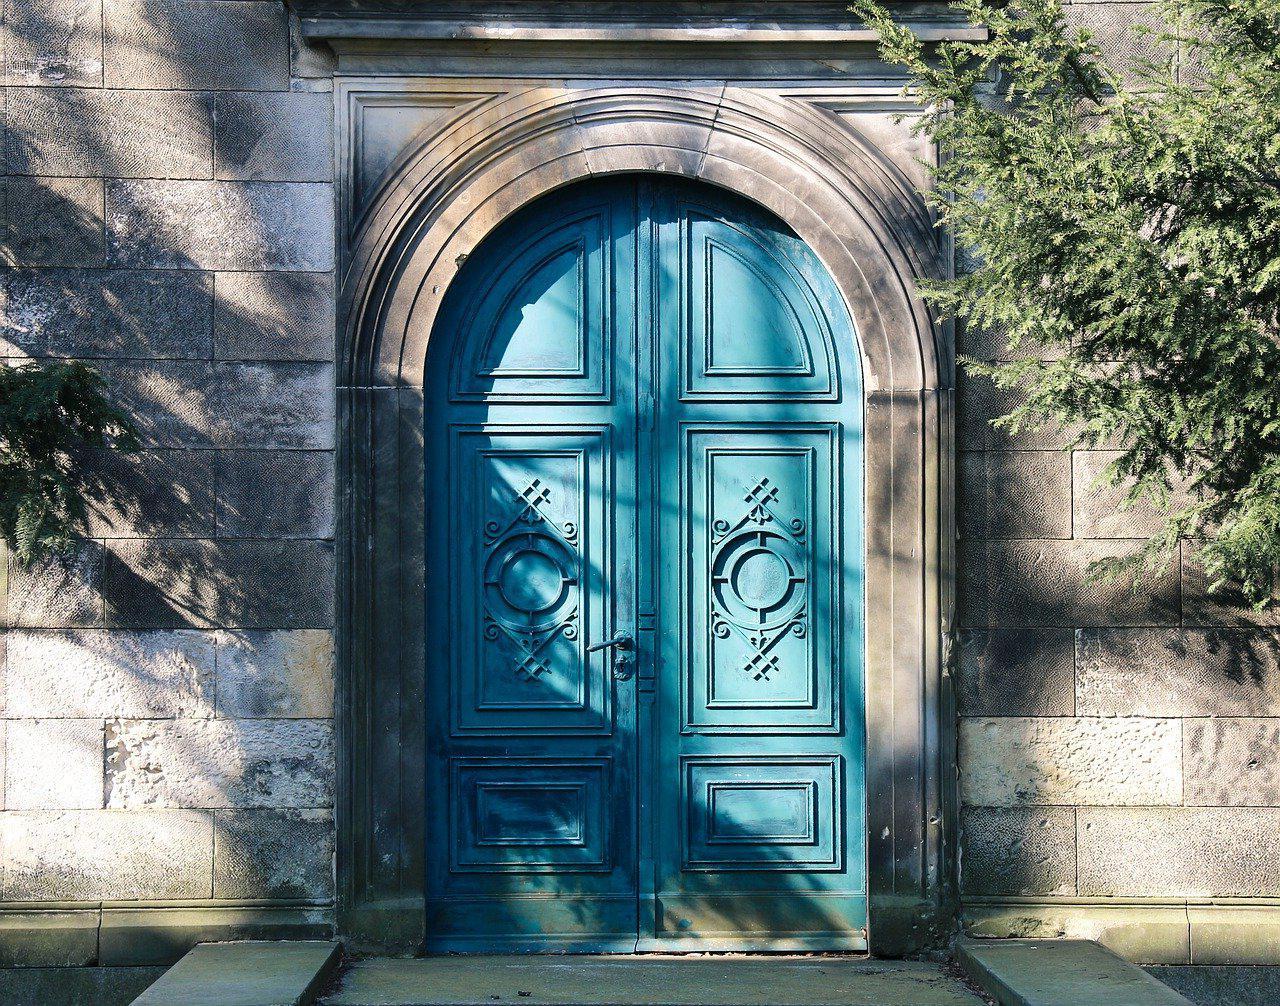 Porte blindée : Prix à Romorantin-Lanthenay 41200 | Porte anti-effraction